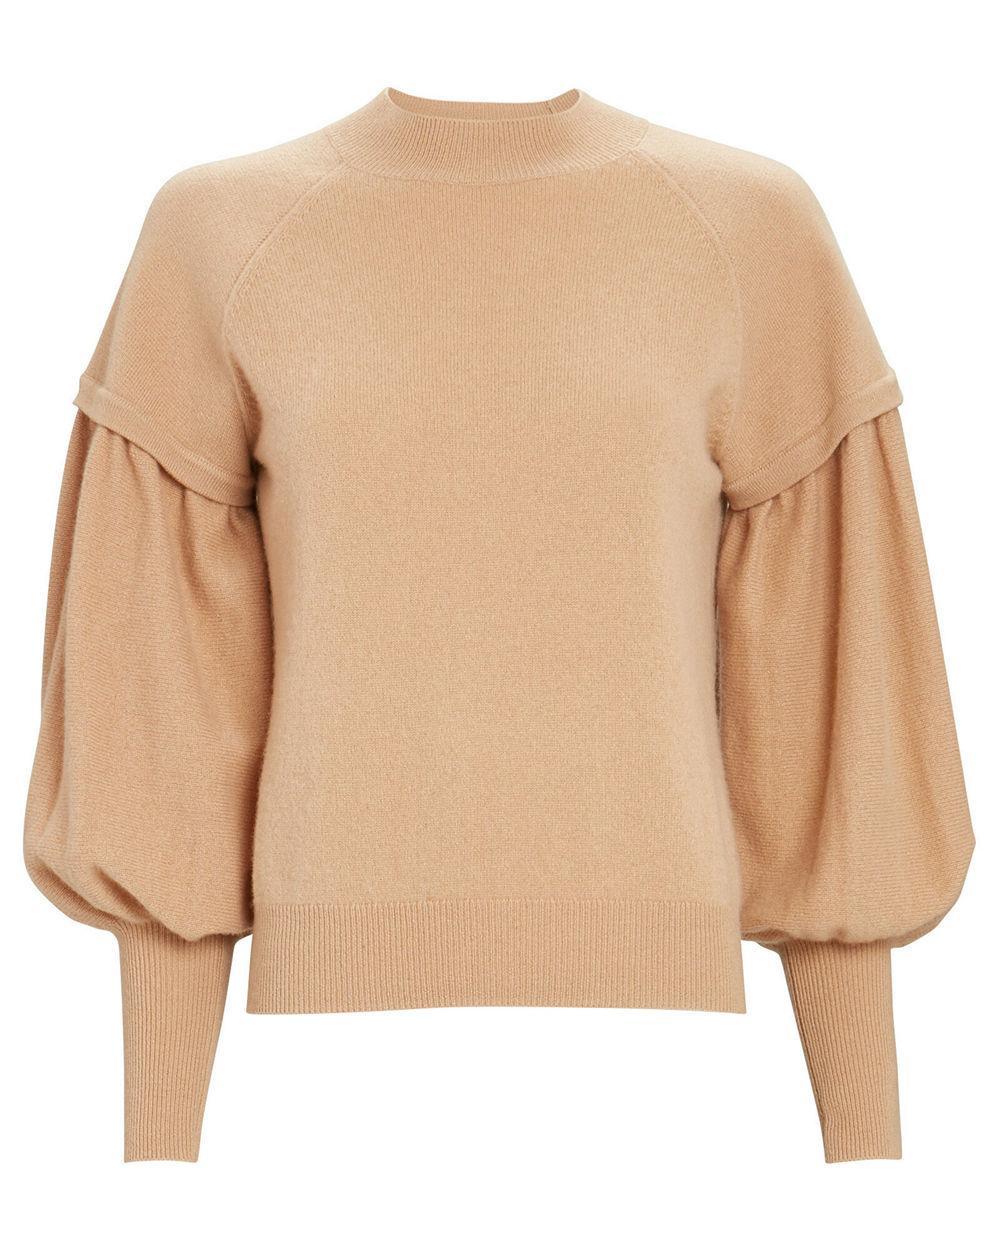 Mackenzie Cashmere Sweater